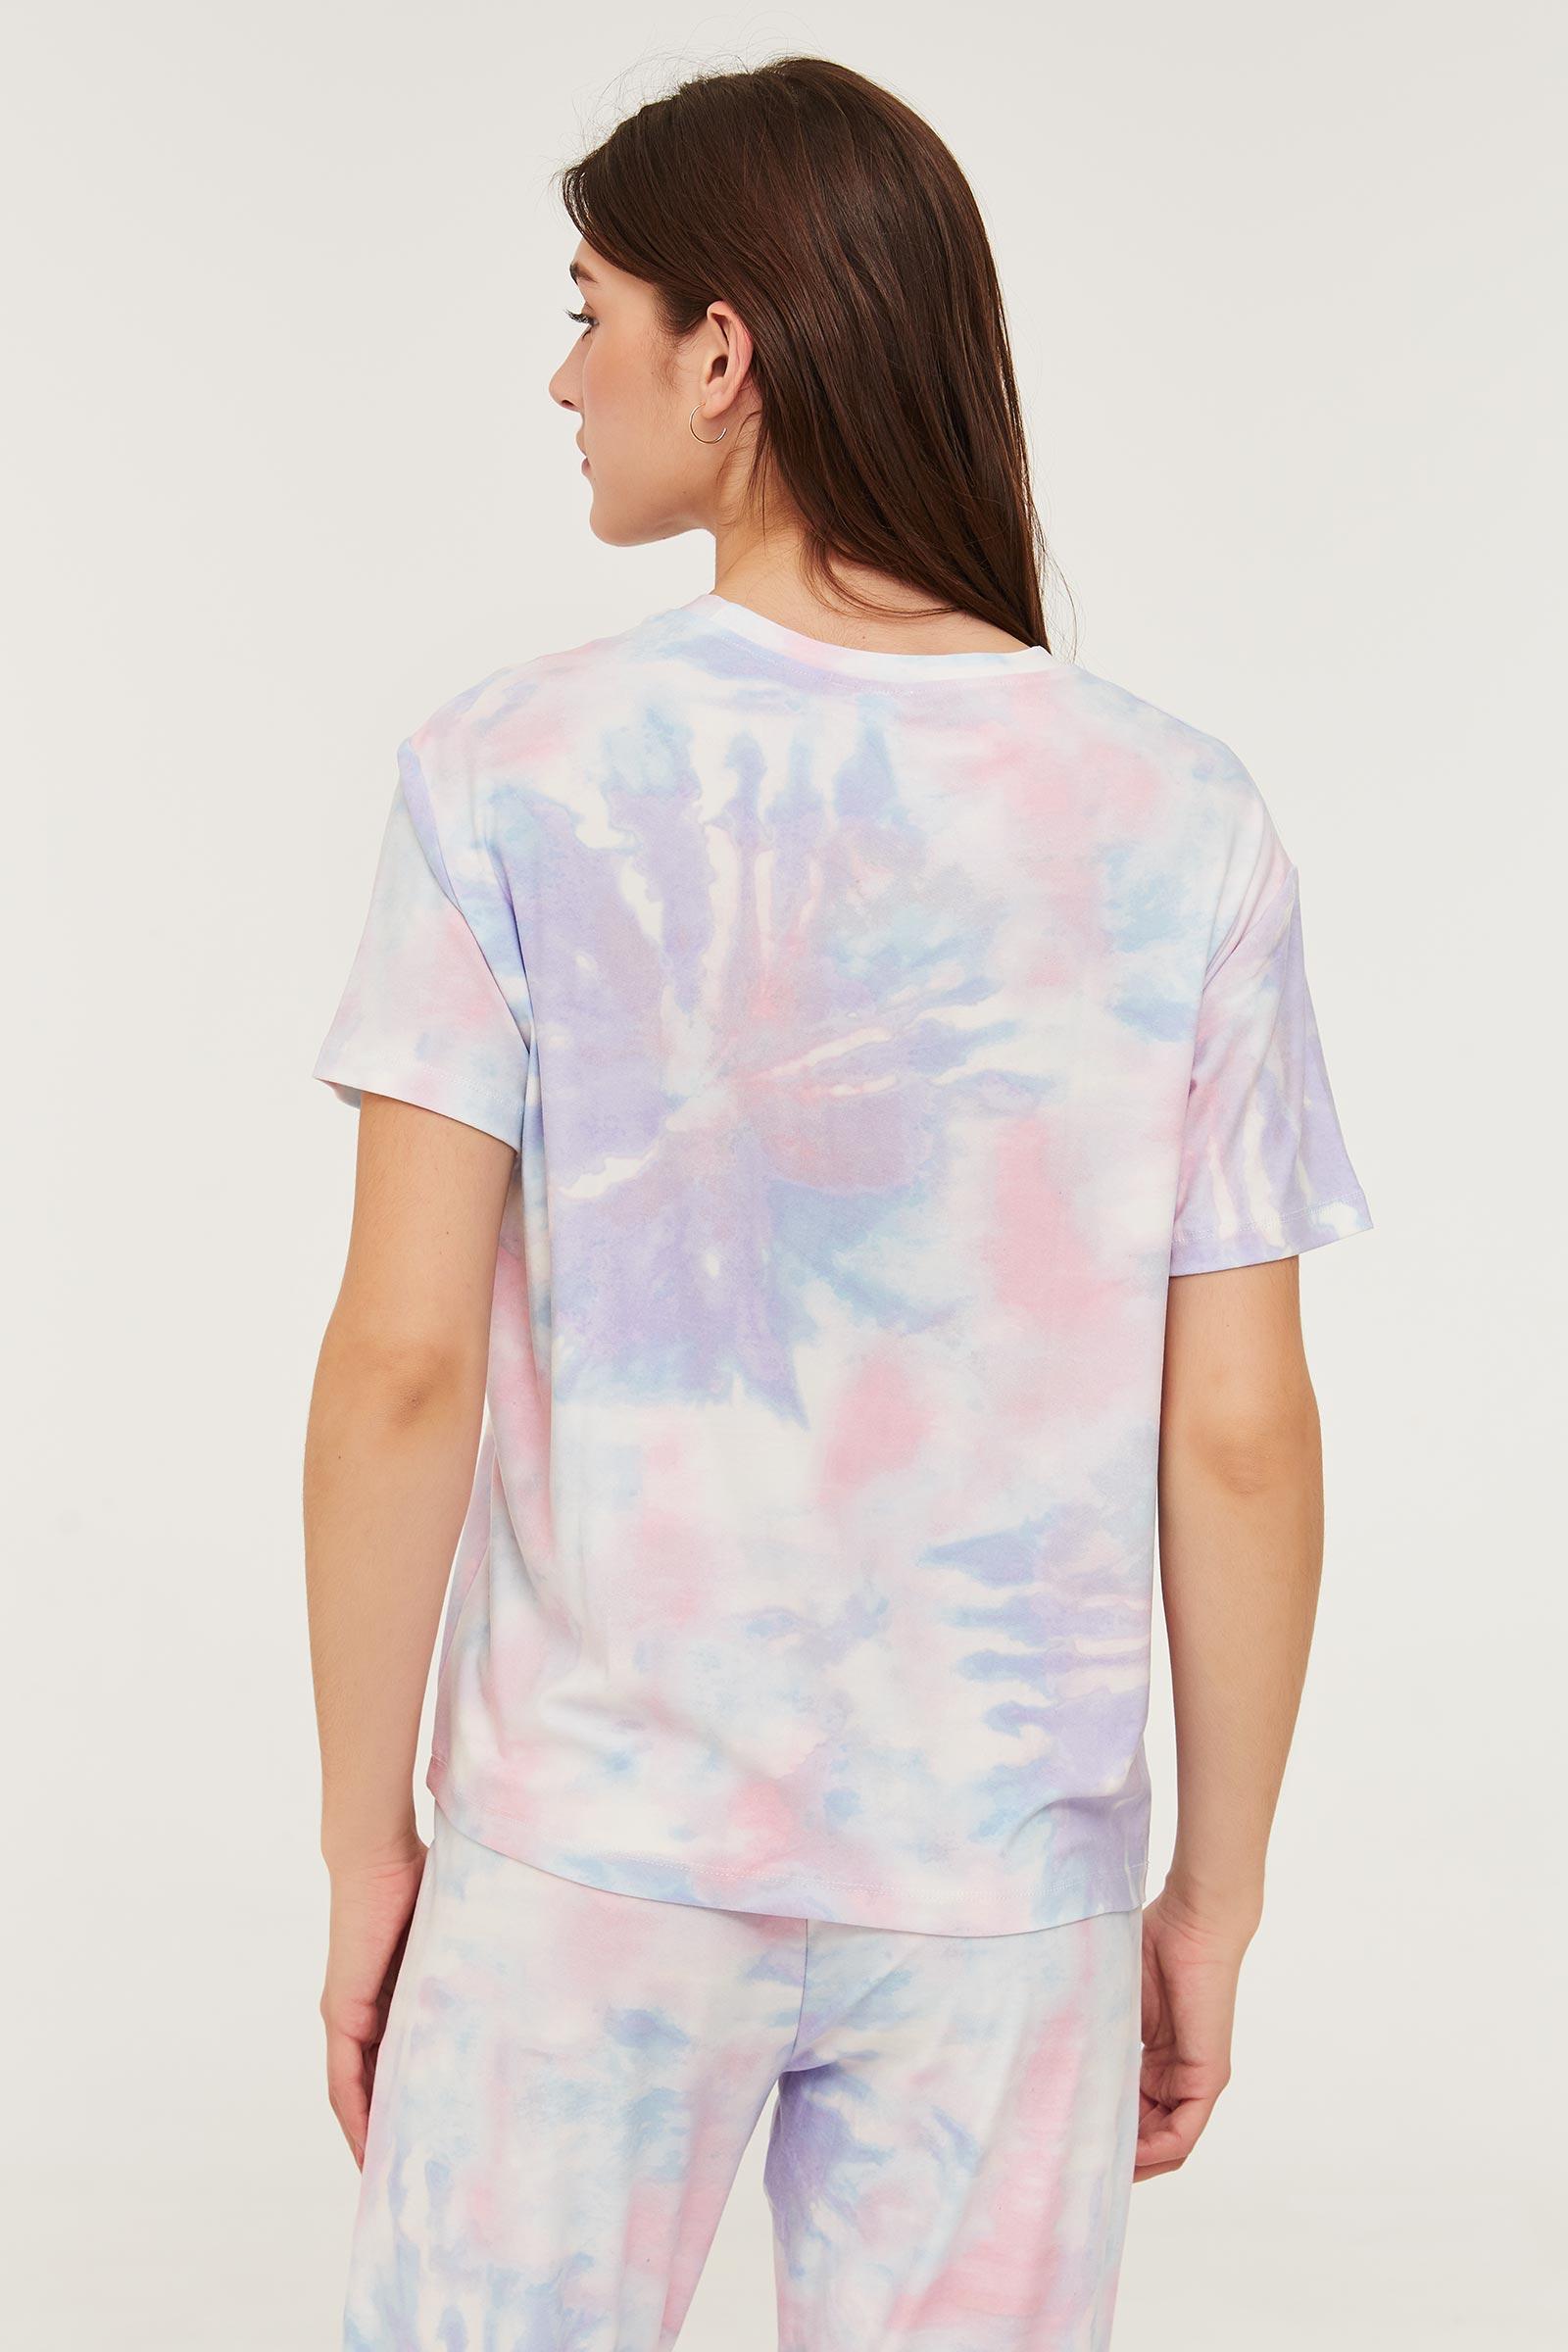 Soft Graphic Tie-dye PJ Tee